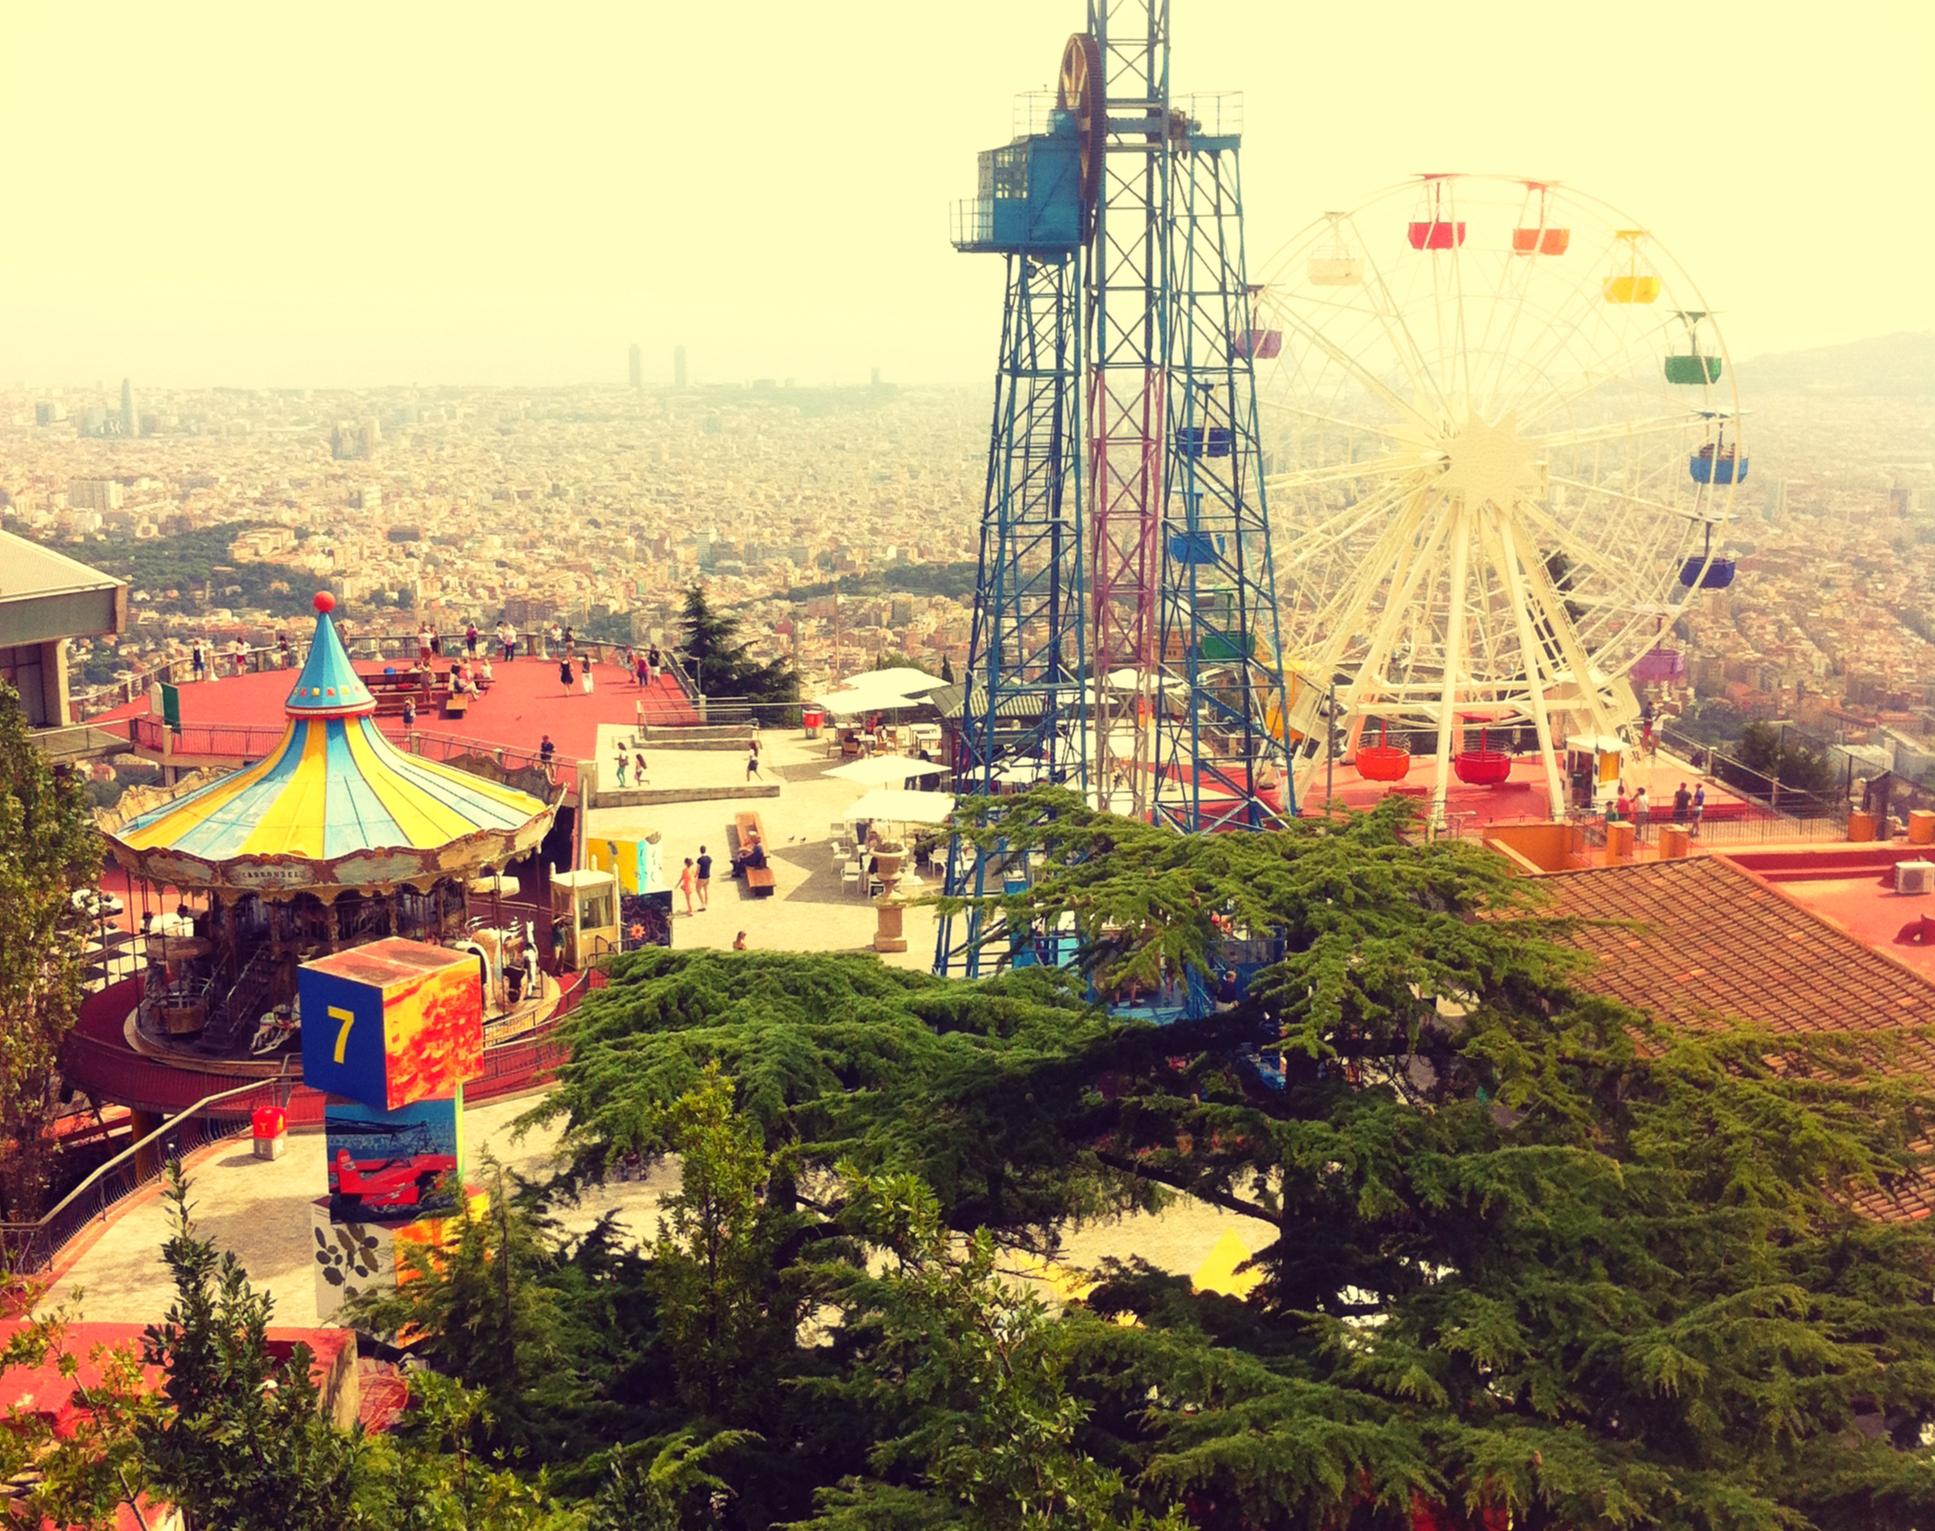 Tibidabo Theme Park Barcelona Mountains